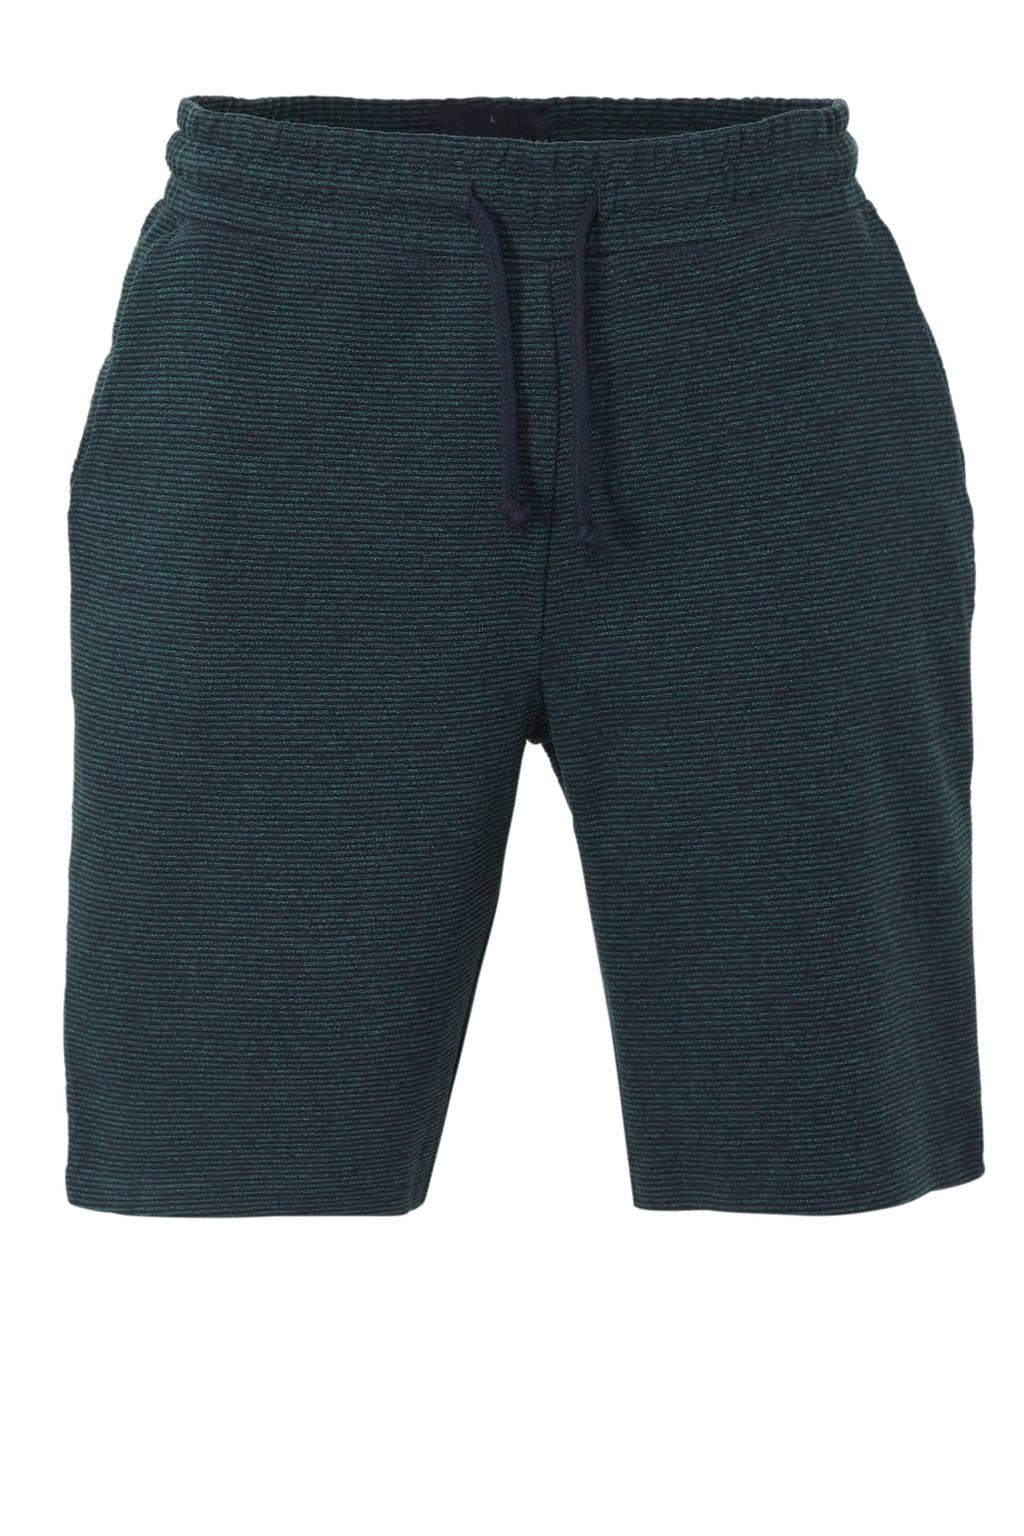 C&A Angelo Litrico gemêleerde sweatshort met textuur, Donkerblauw/groen